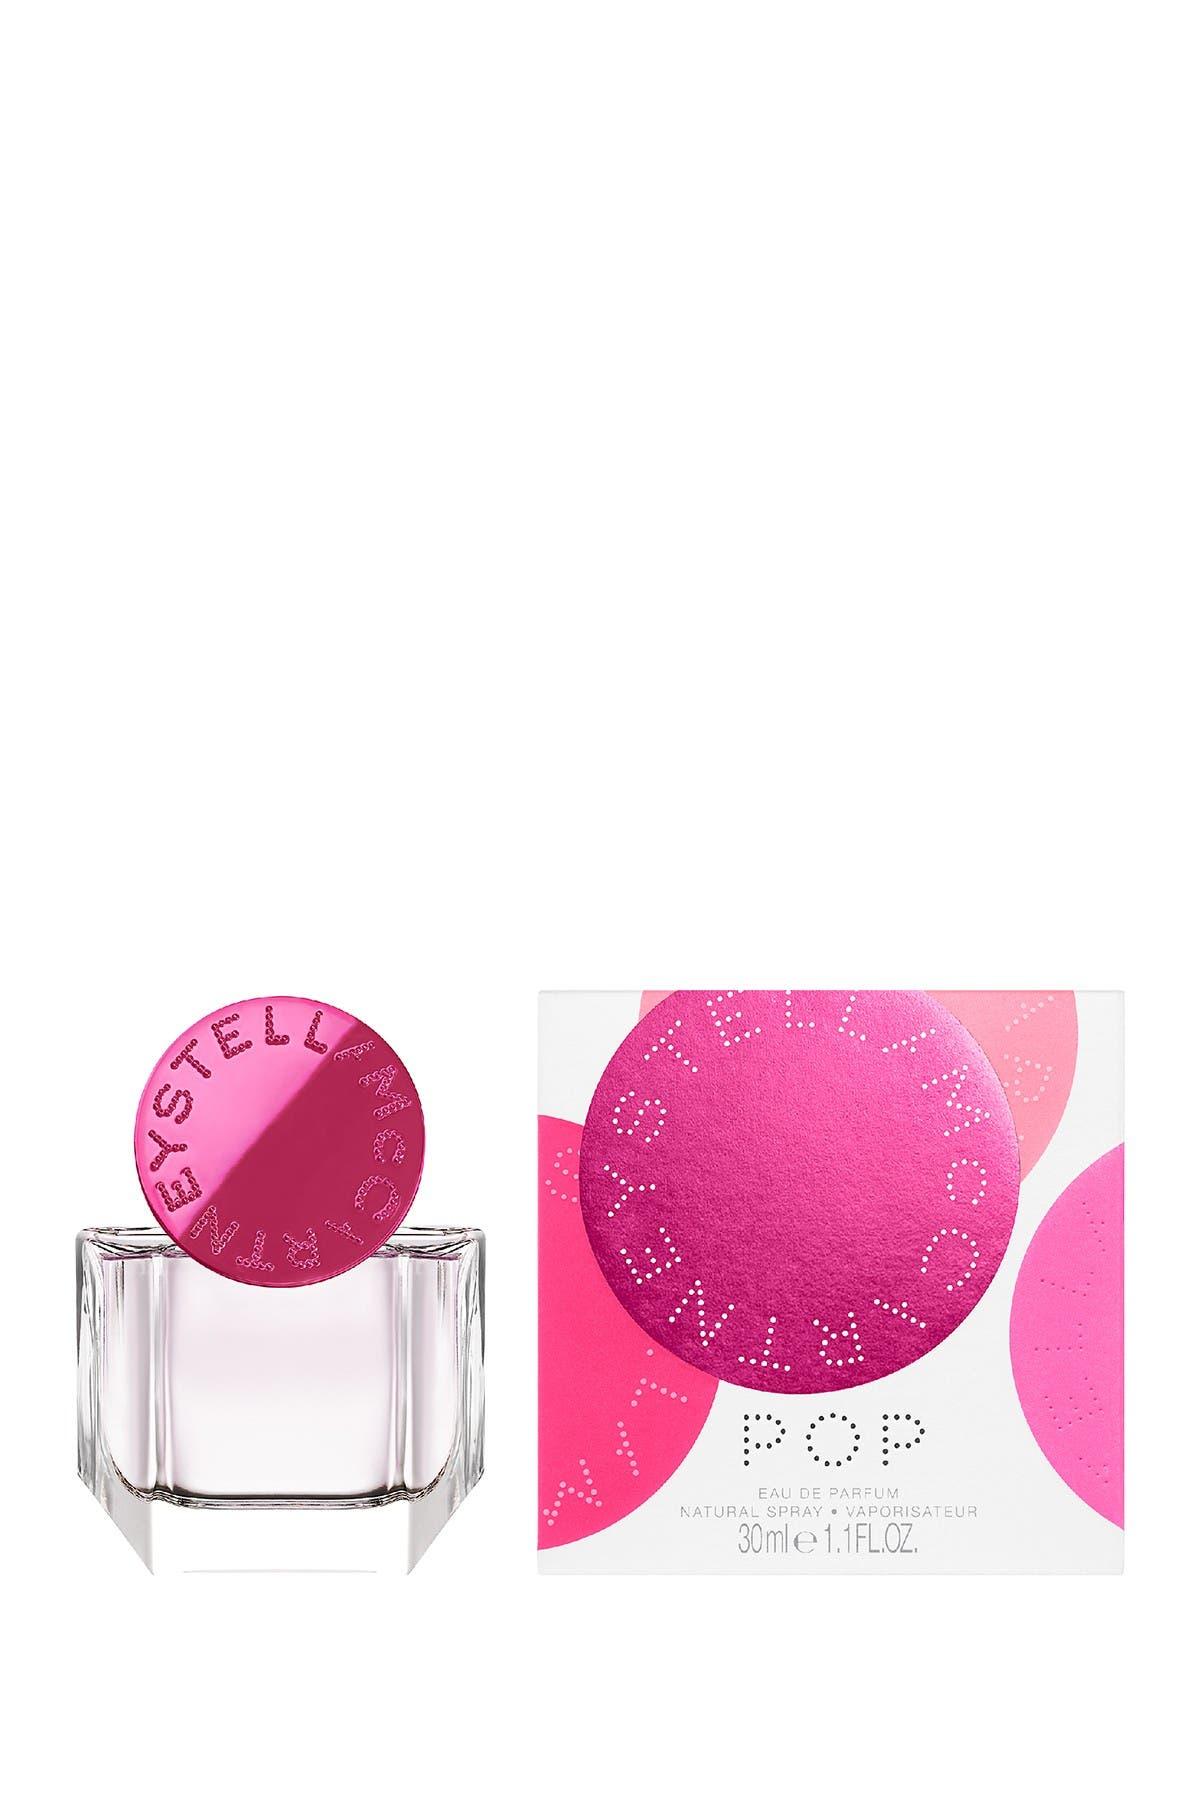 Image of Stella McCartney POP Eau de Parfum Spray - 1.1 oz.